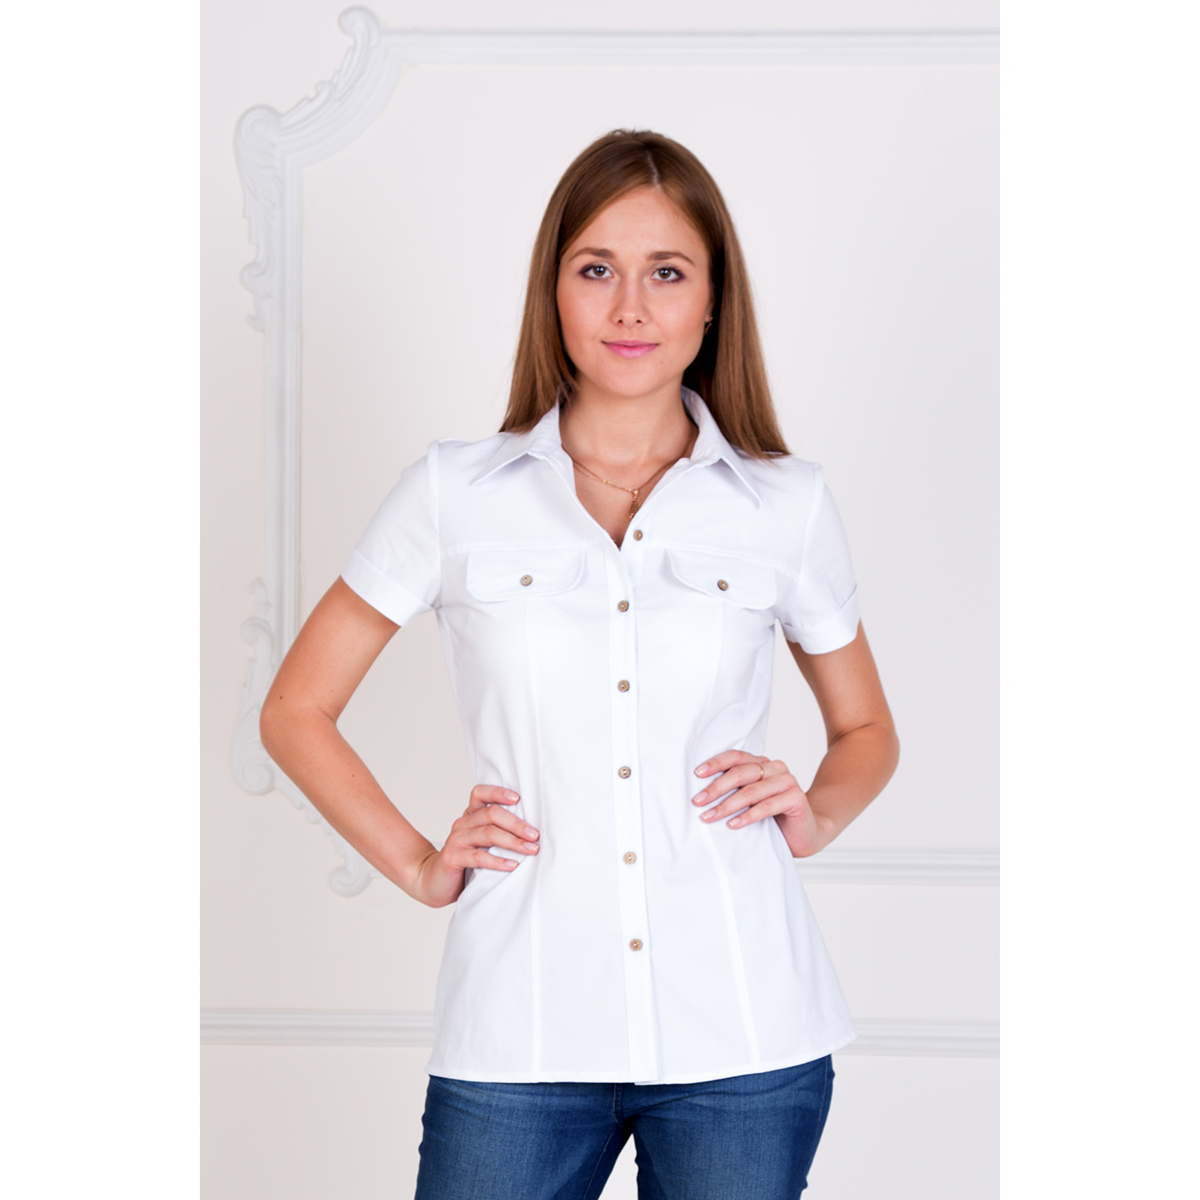 Женская рубашка  Александра  Белый, размер 40 - Женская одежда артикул: 14959